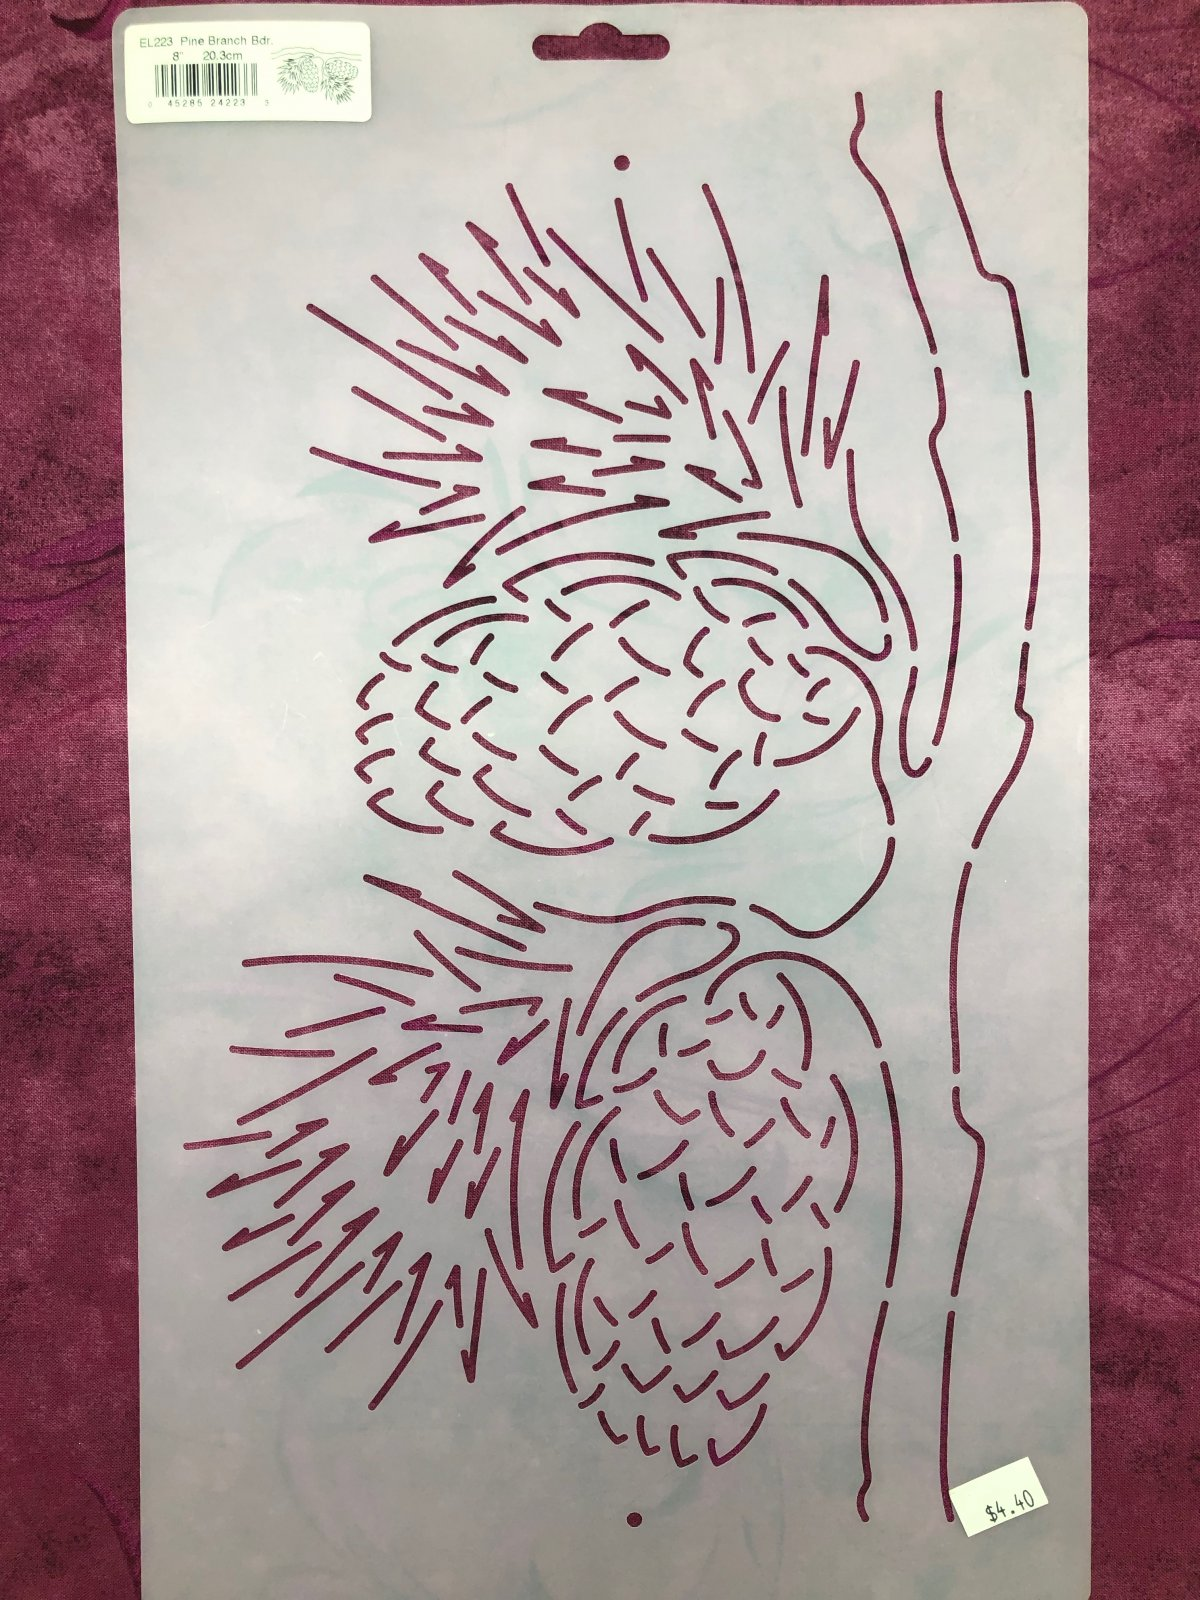 EL223 Pine Branch Bdr. 8 Inch Stencil